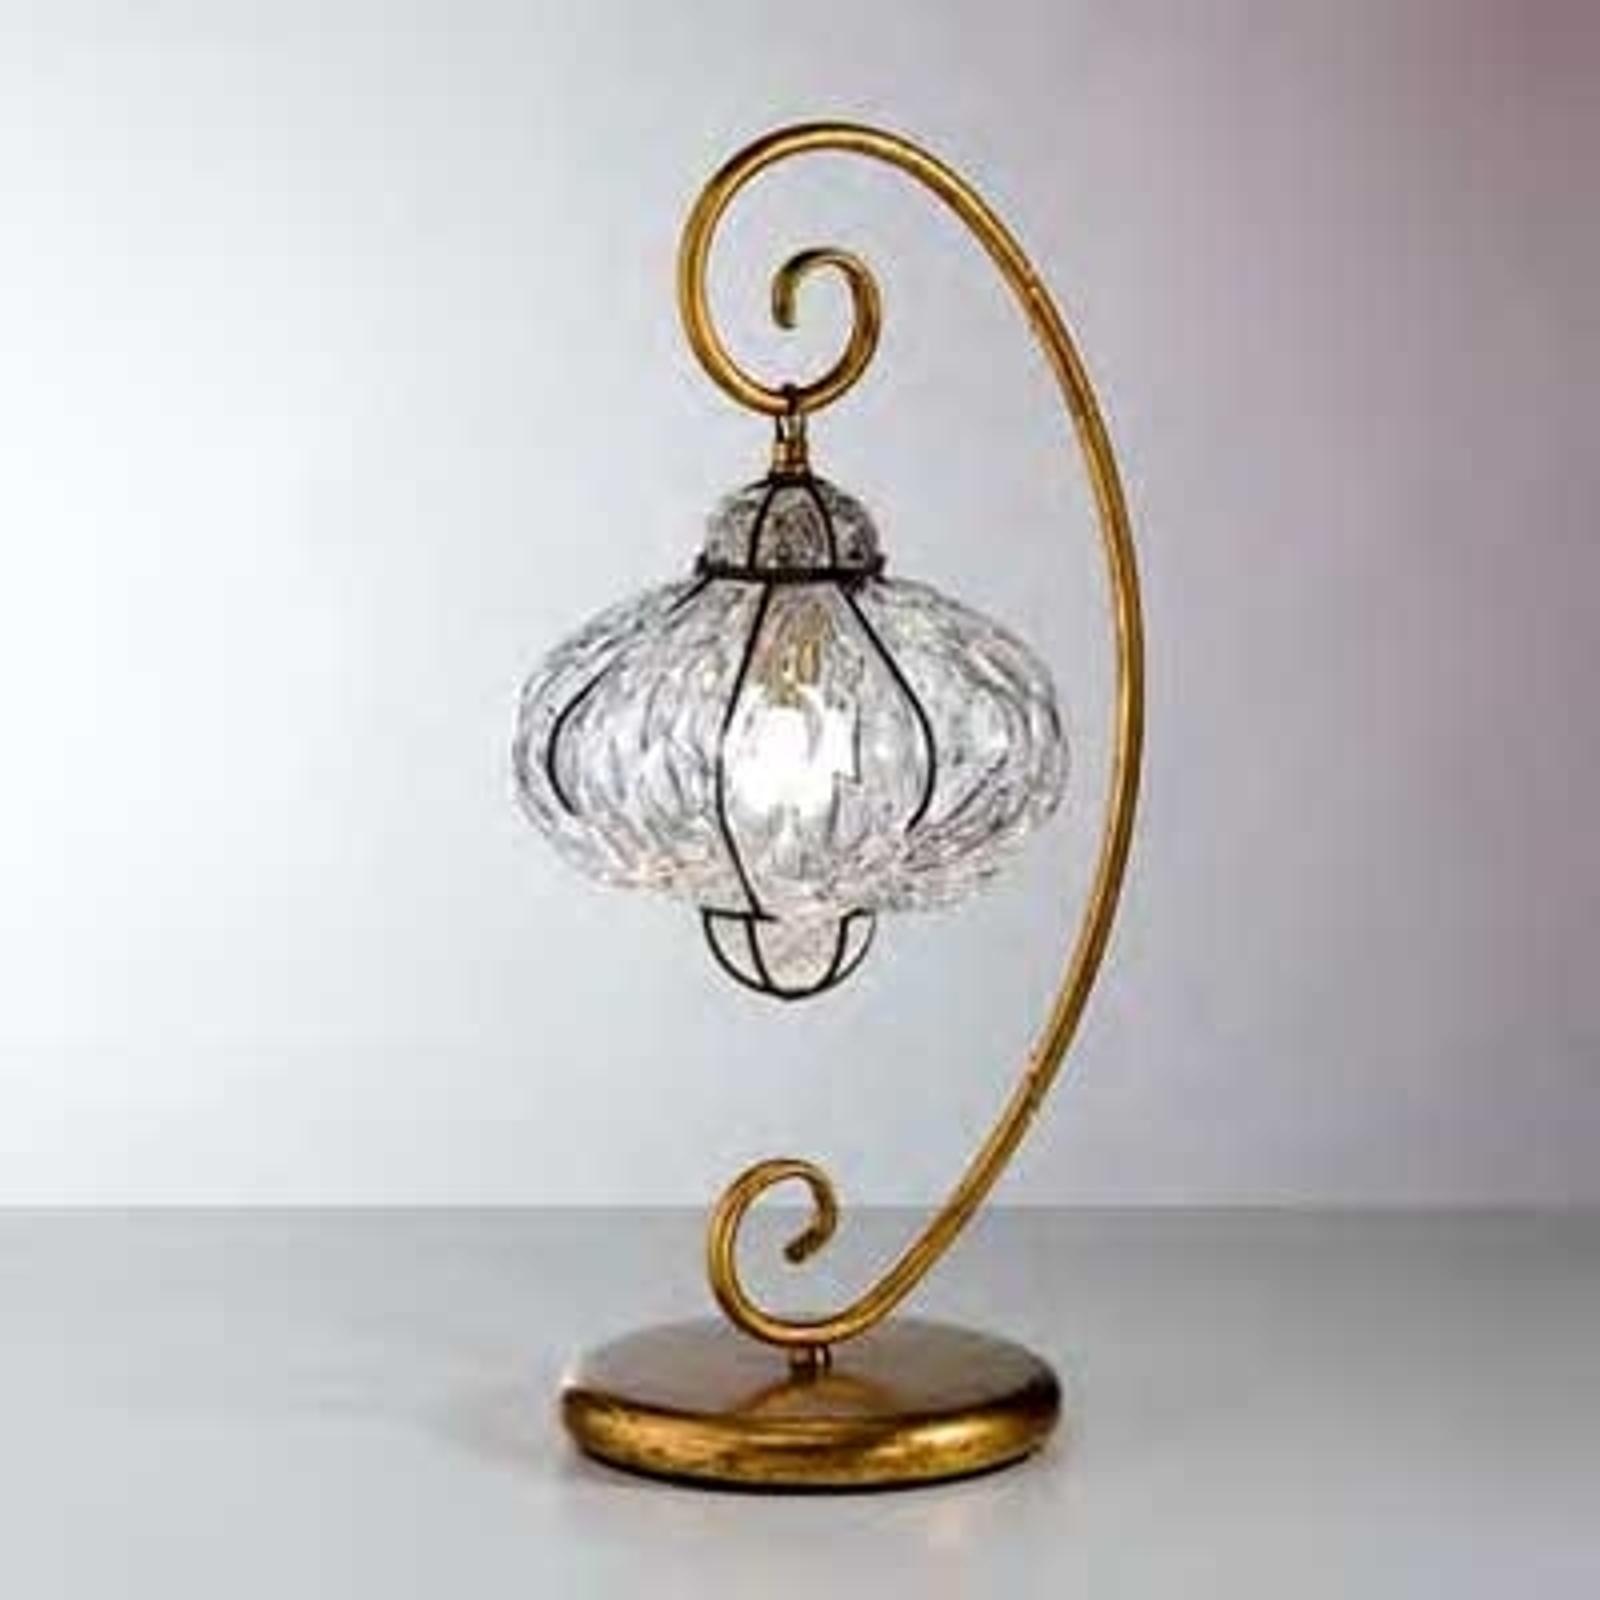 Oriëntaalse tafellamp SULTANO, handgemaakt